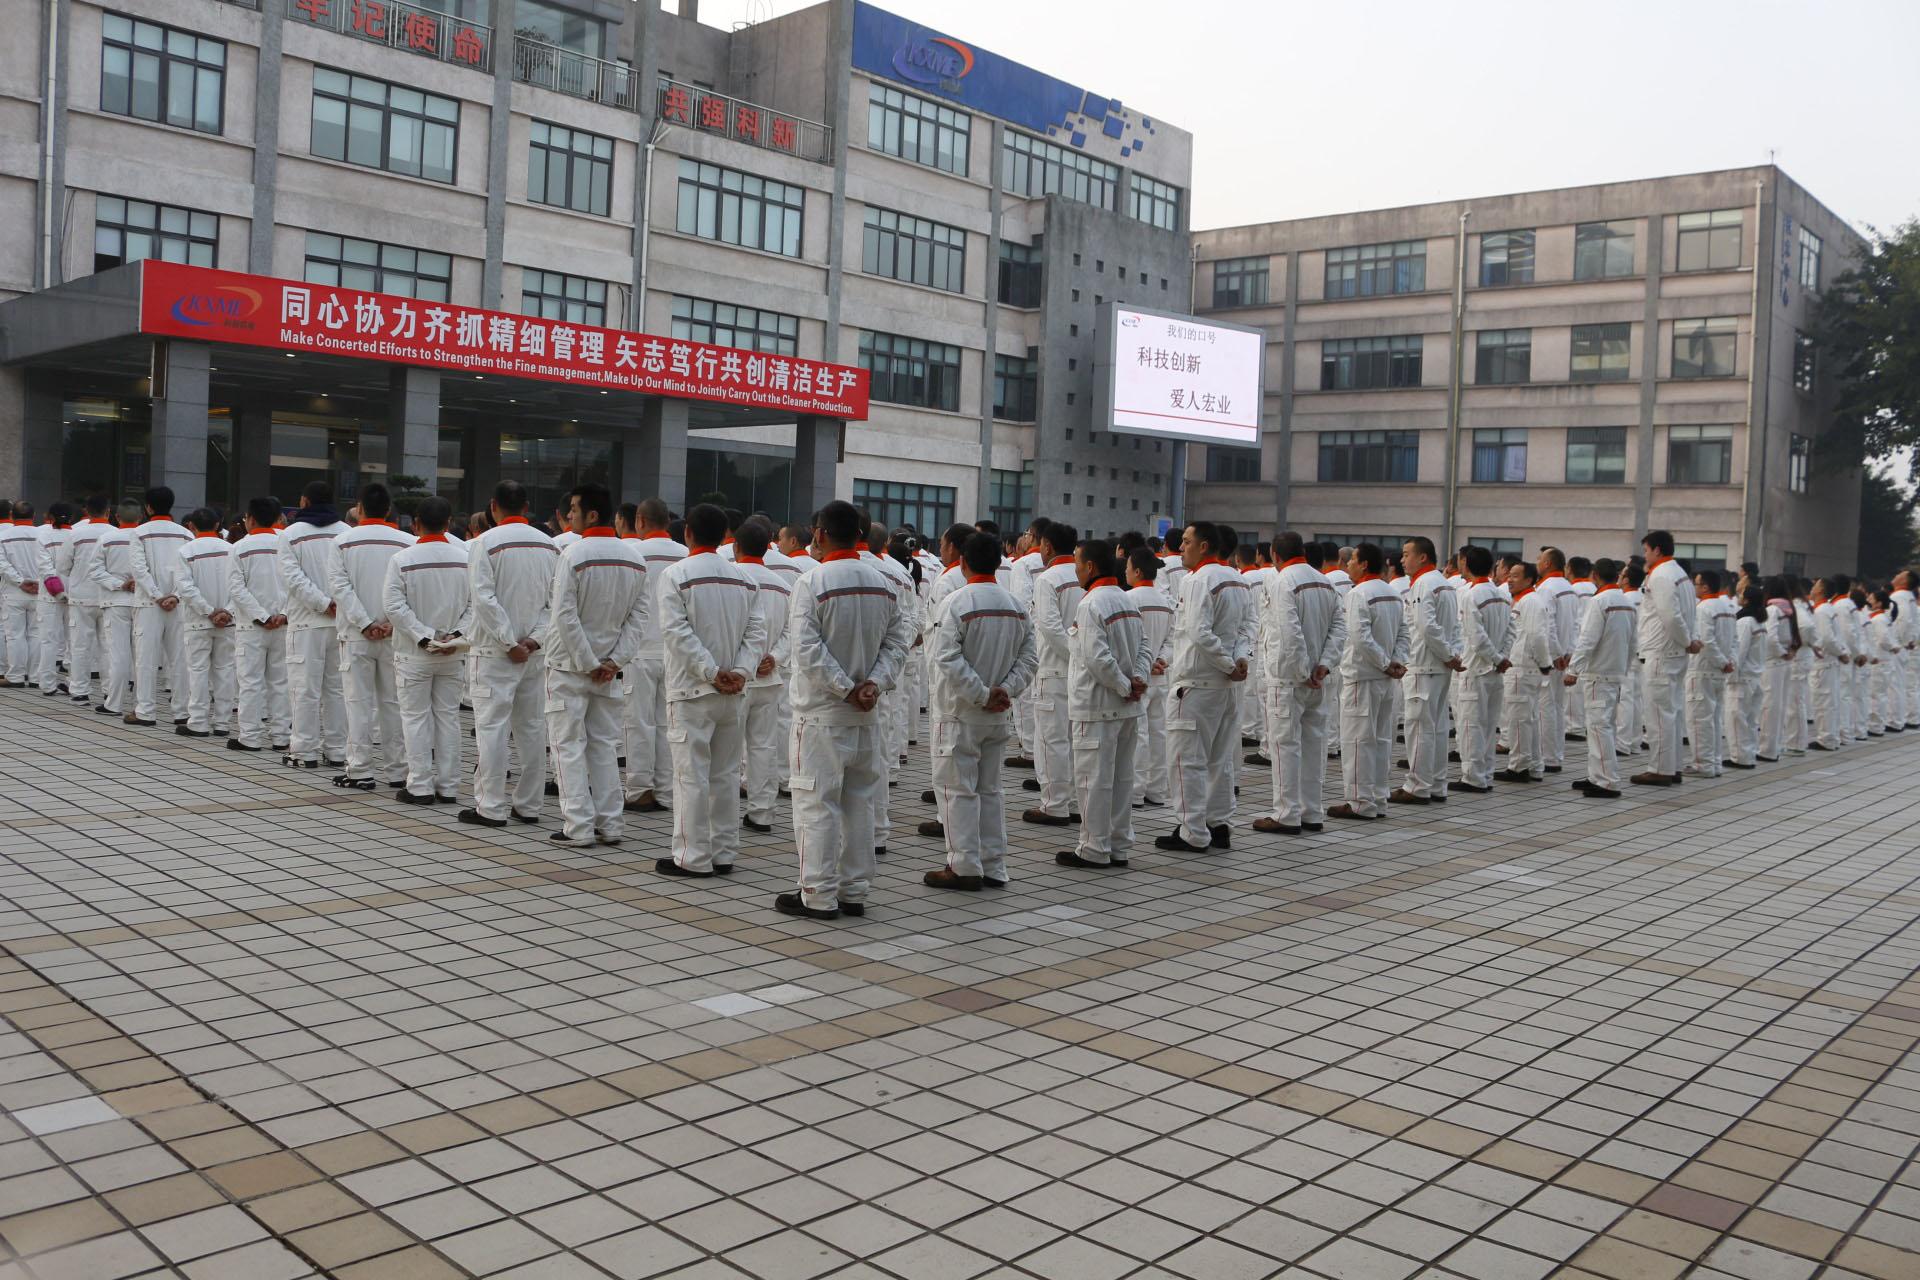 http://qiniu.cloudhong.com/image_2020-01-12_5e1ac9c9f00a5.jpg